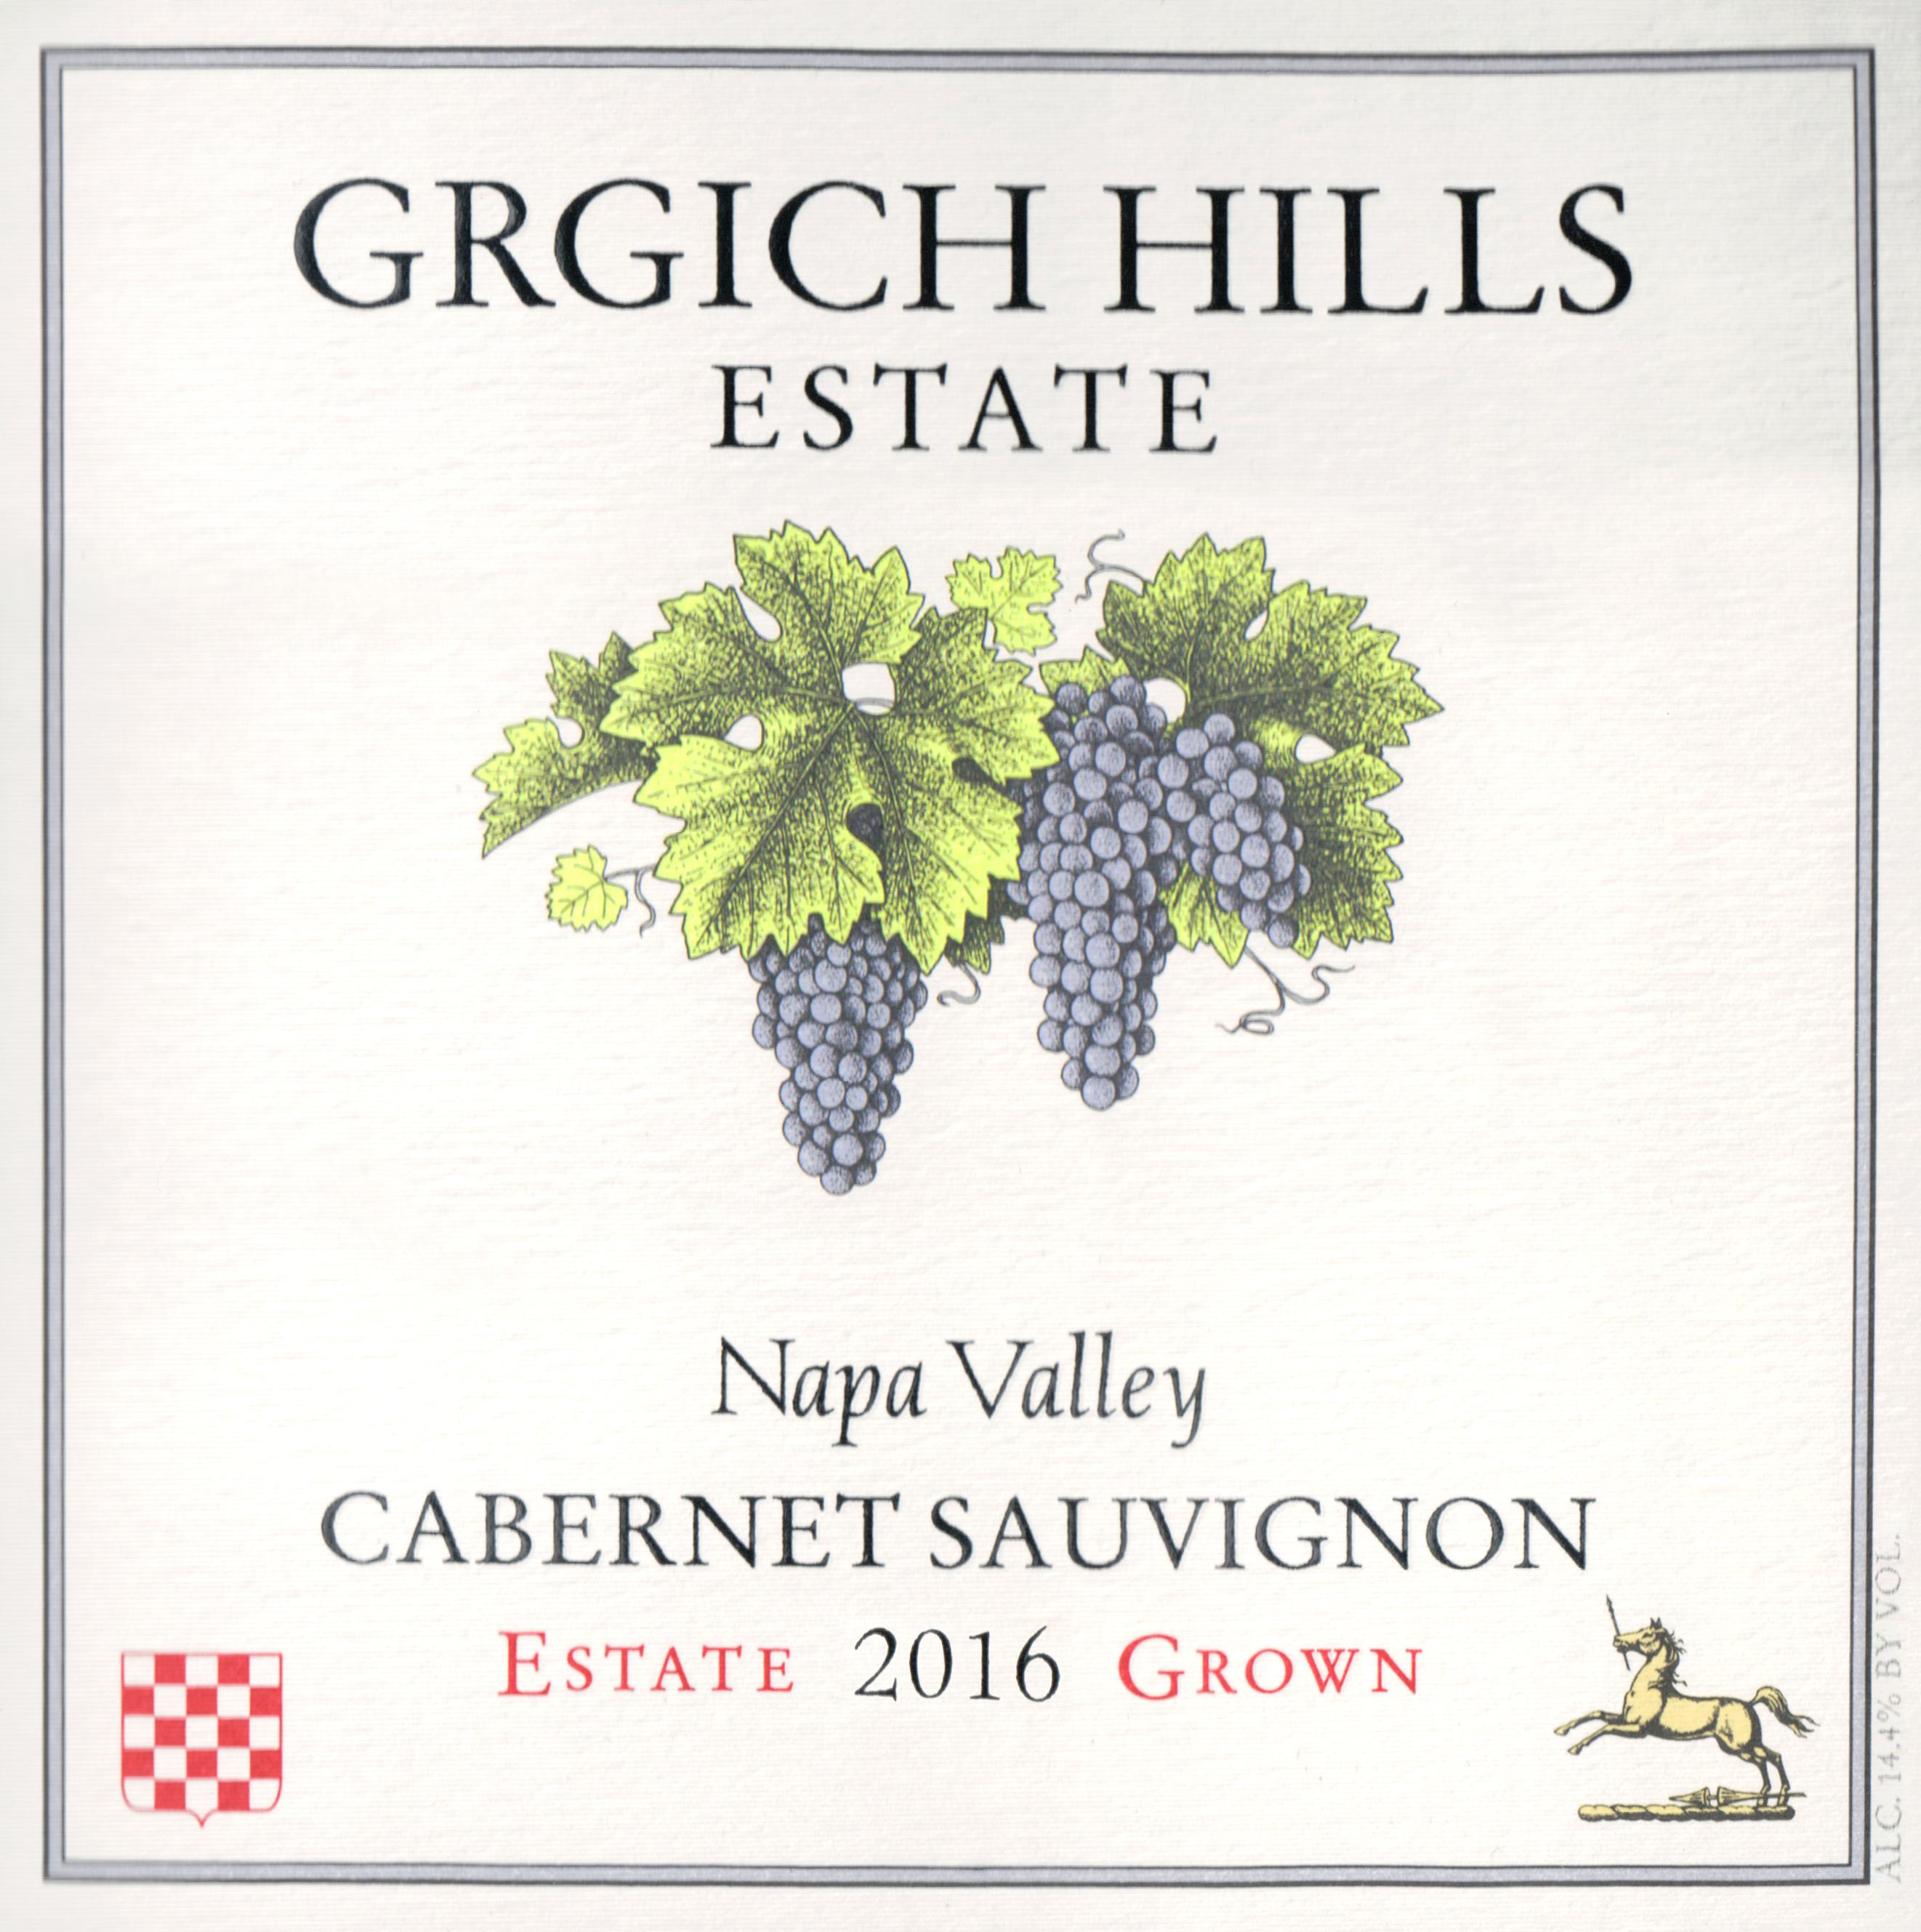 Grgich Hills Cabernet Sauvignon Half Bottle 2016